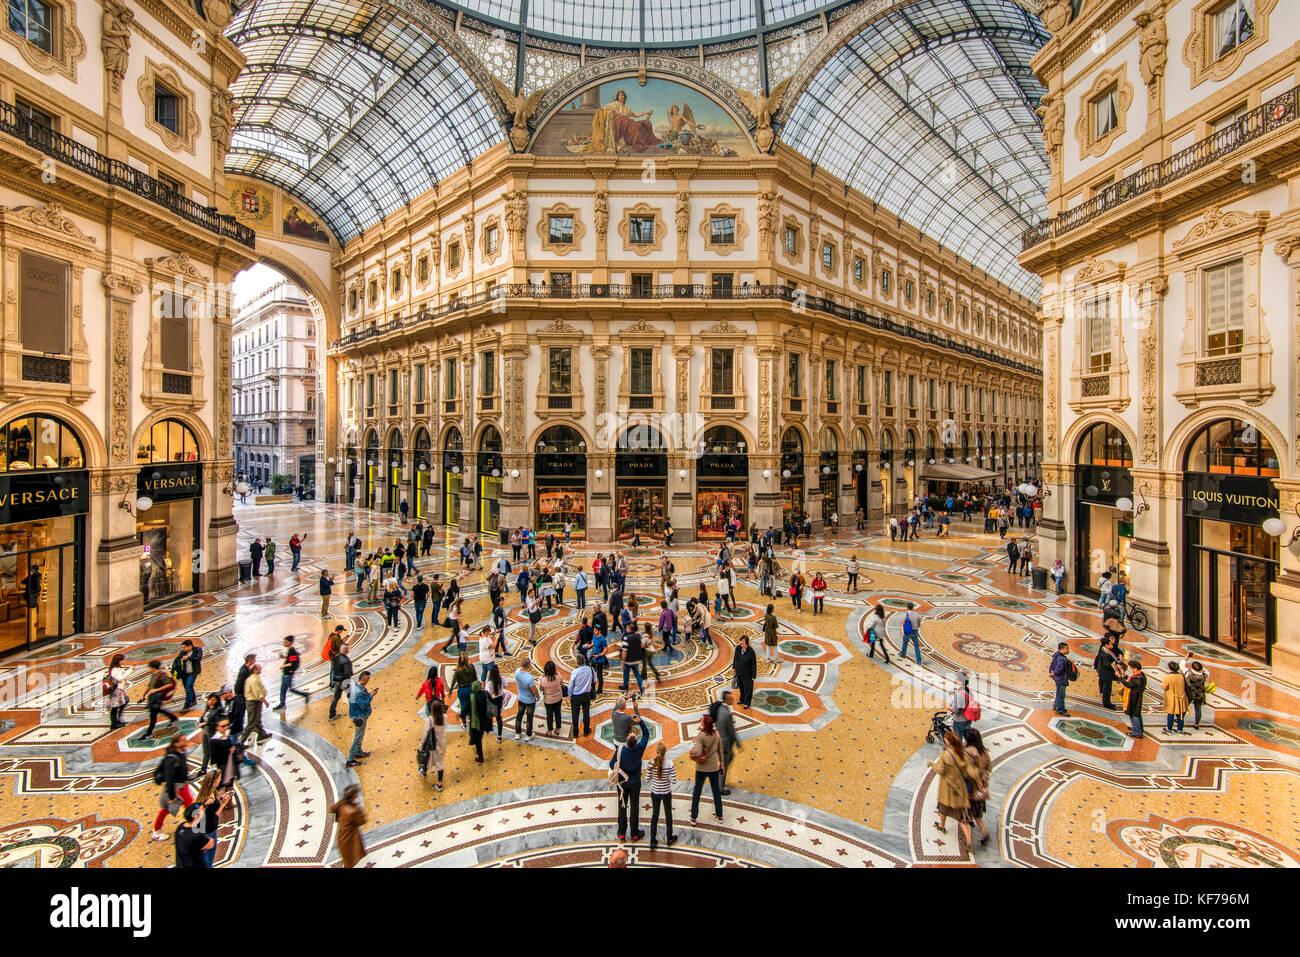 Galleria Vittorio Emanuele II Shopping Mall, Mailand, Lombardei, Italien Stockbild